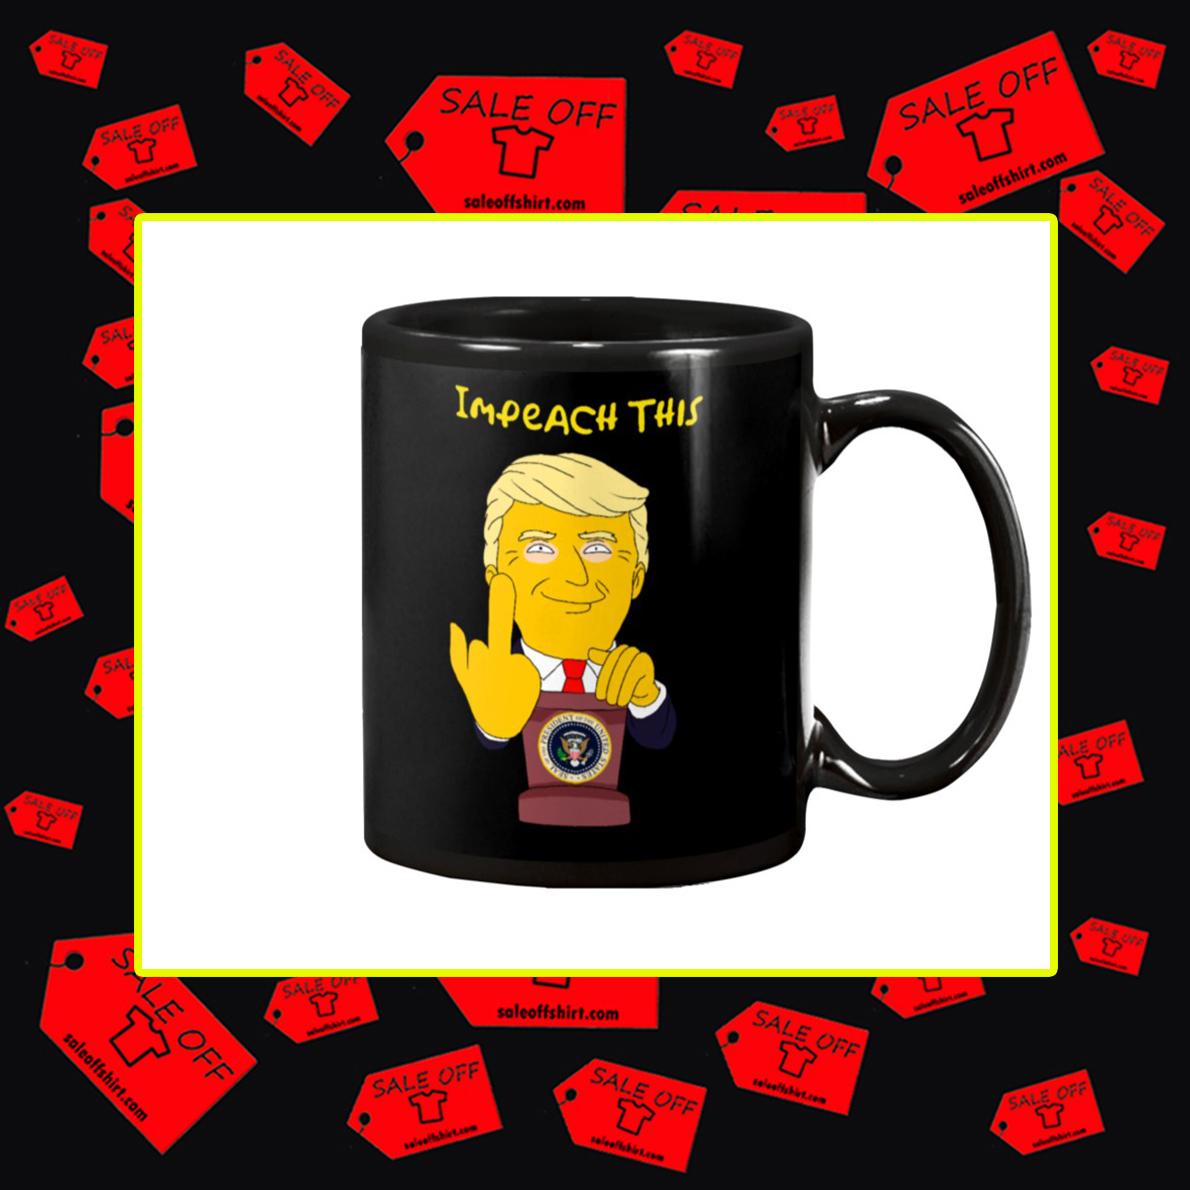 Impeach This Trump Fuck You Mug